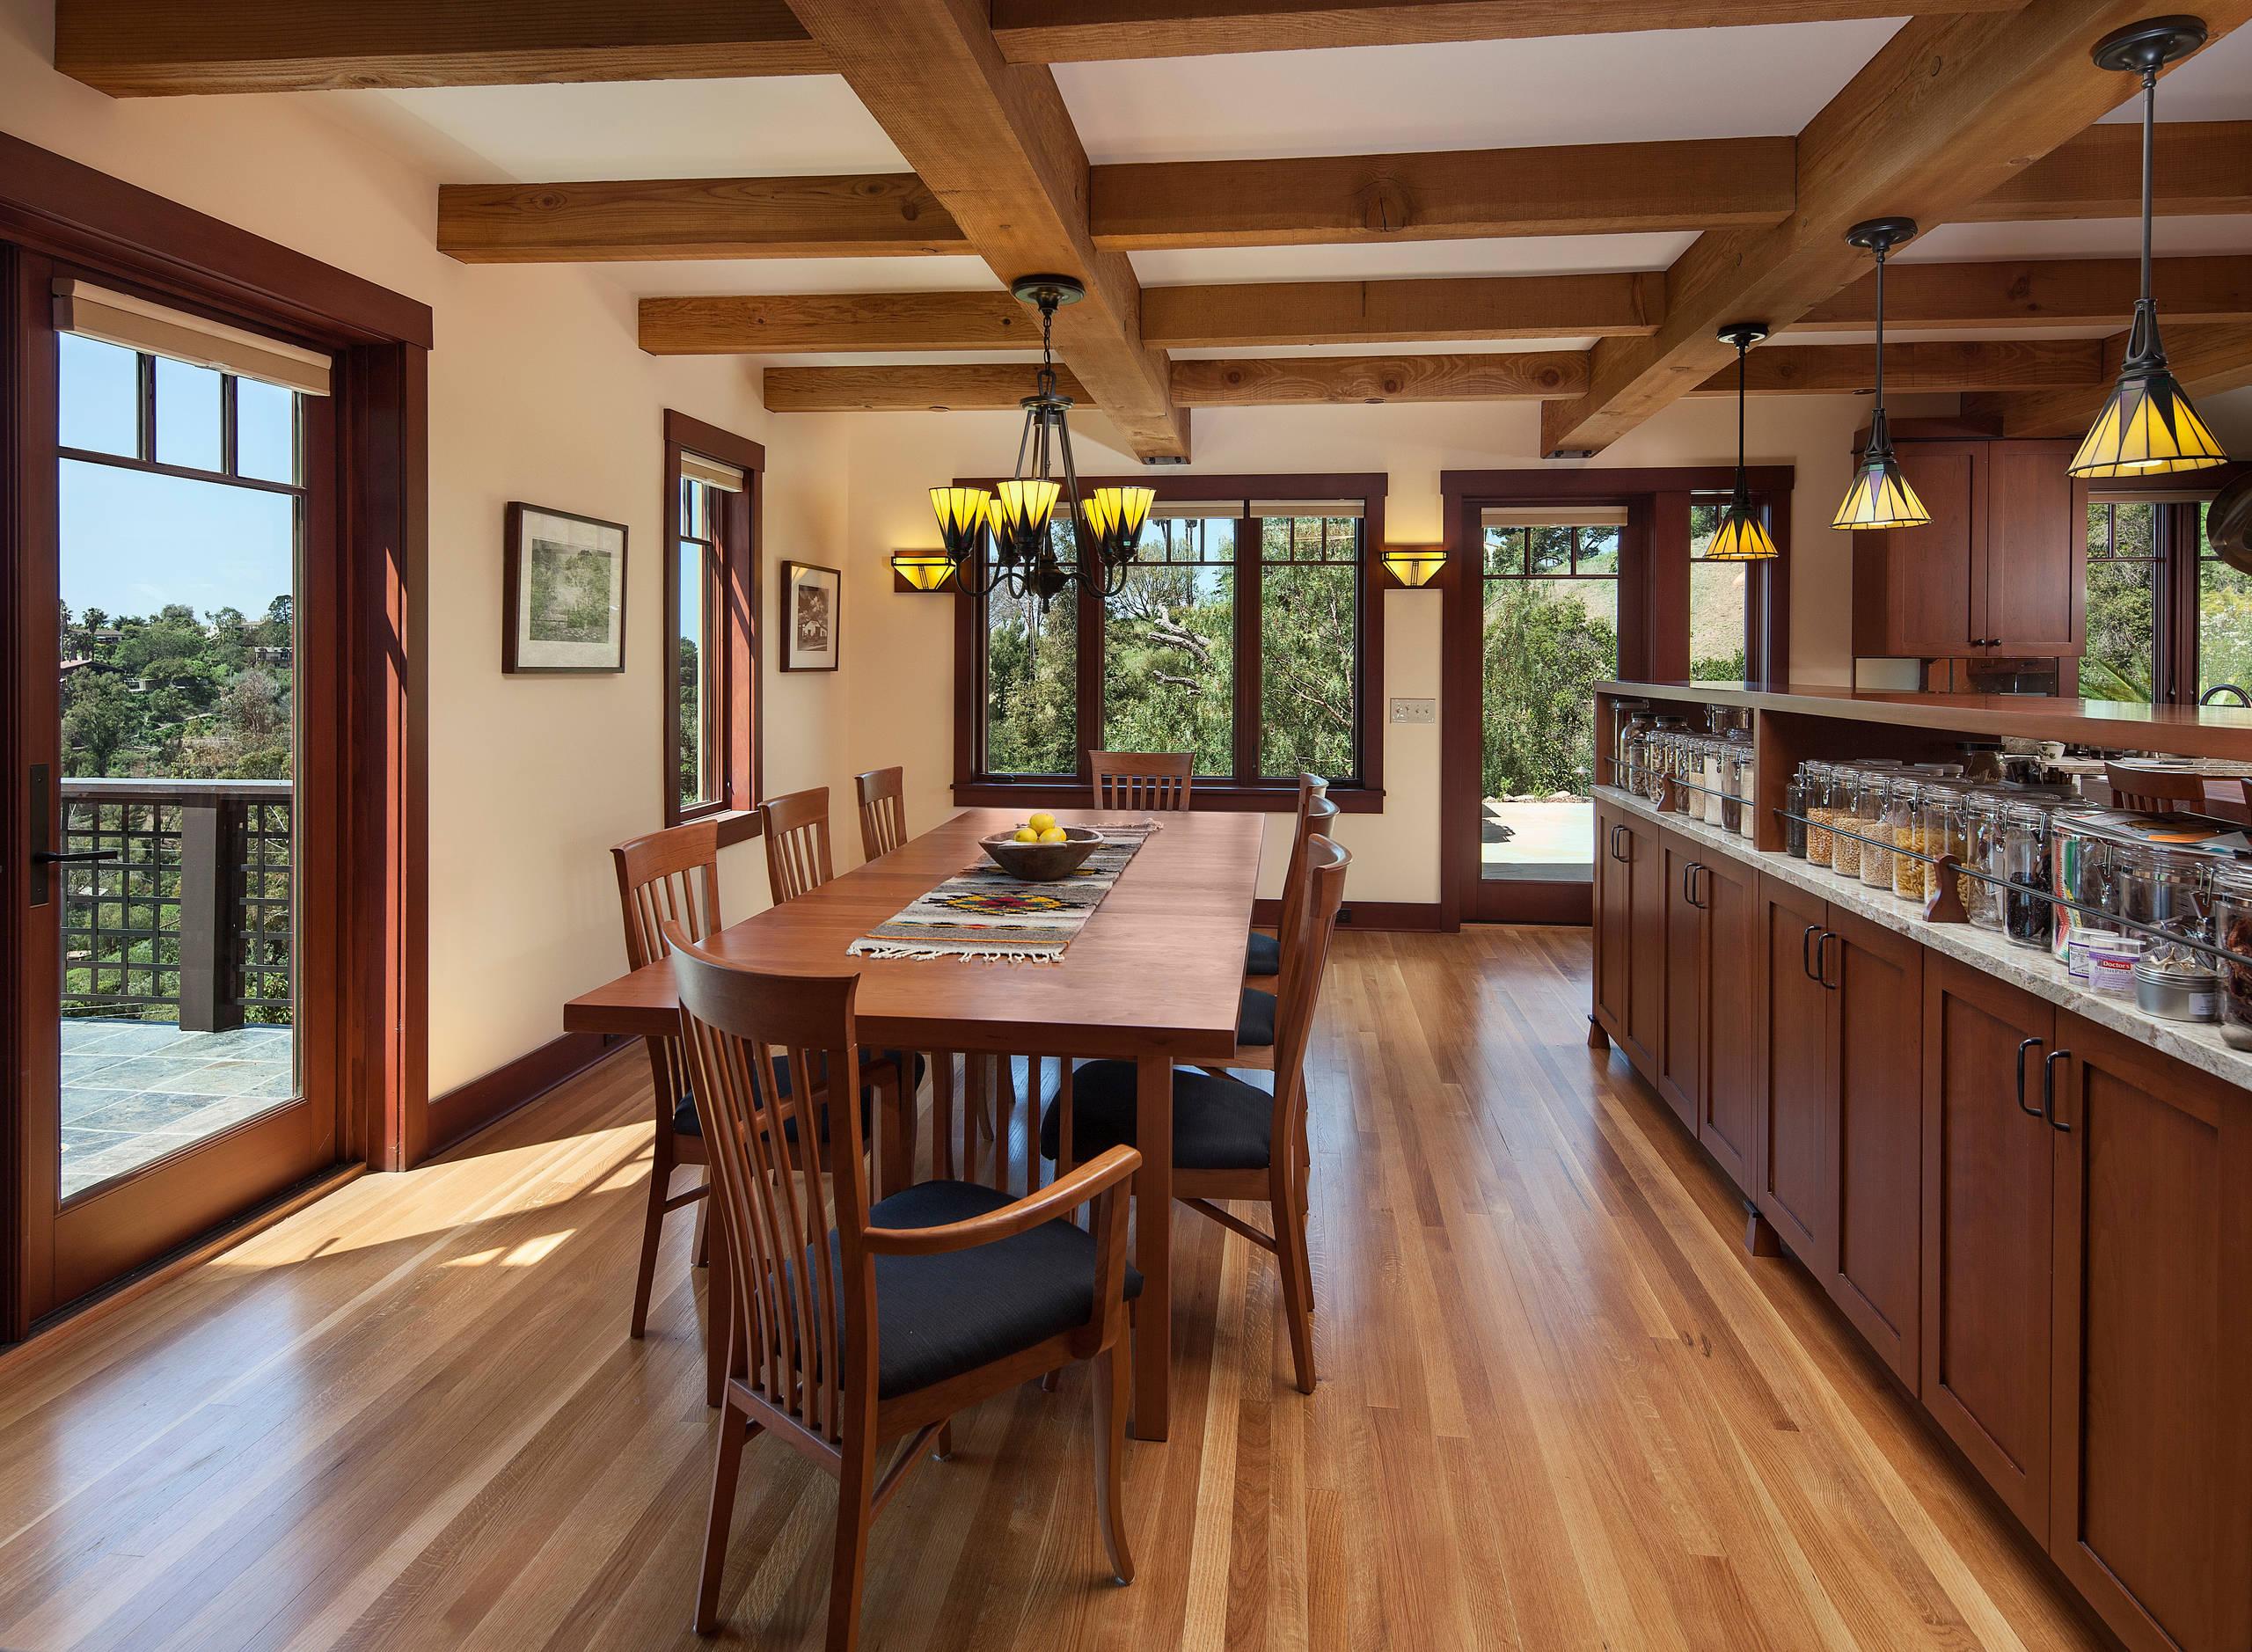 General contractor santa cruz Craftsman Dining Room chandelier pendant lighting wood dining chairs wood dining table